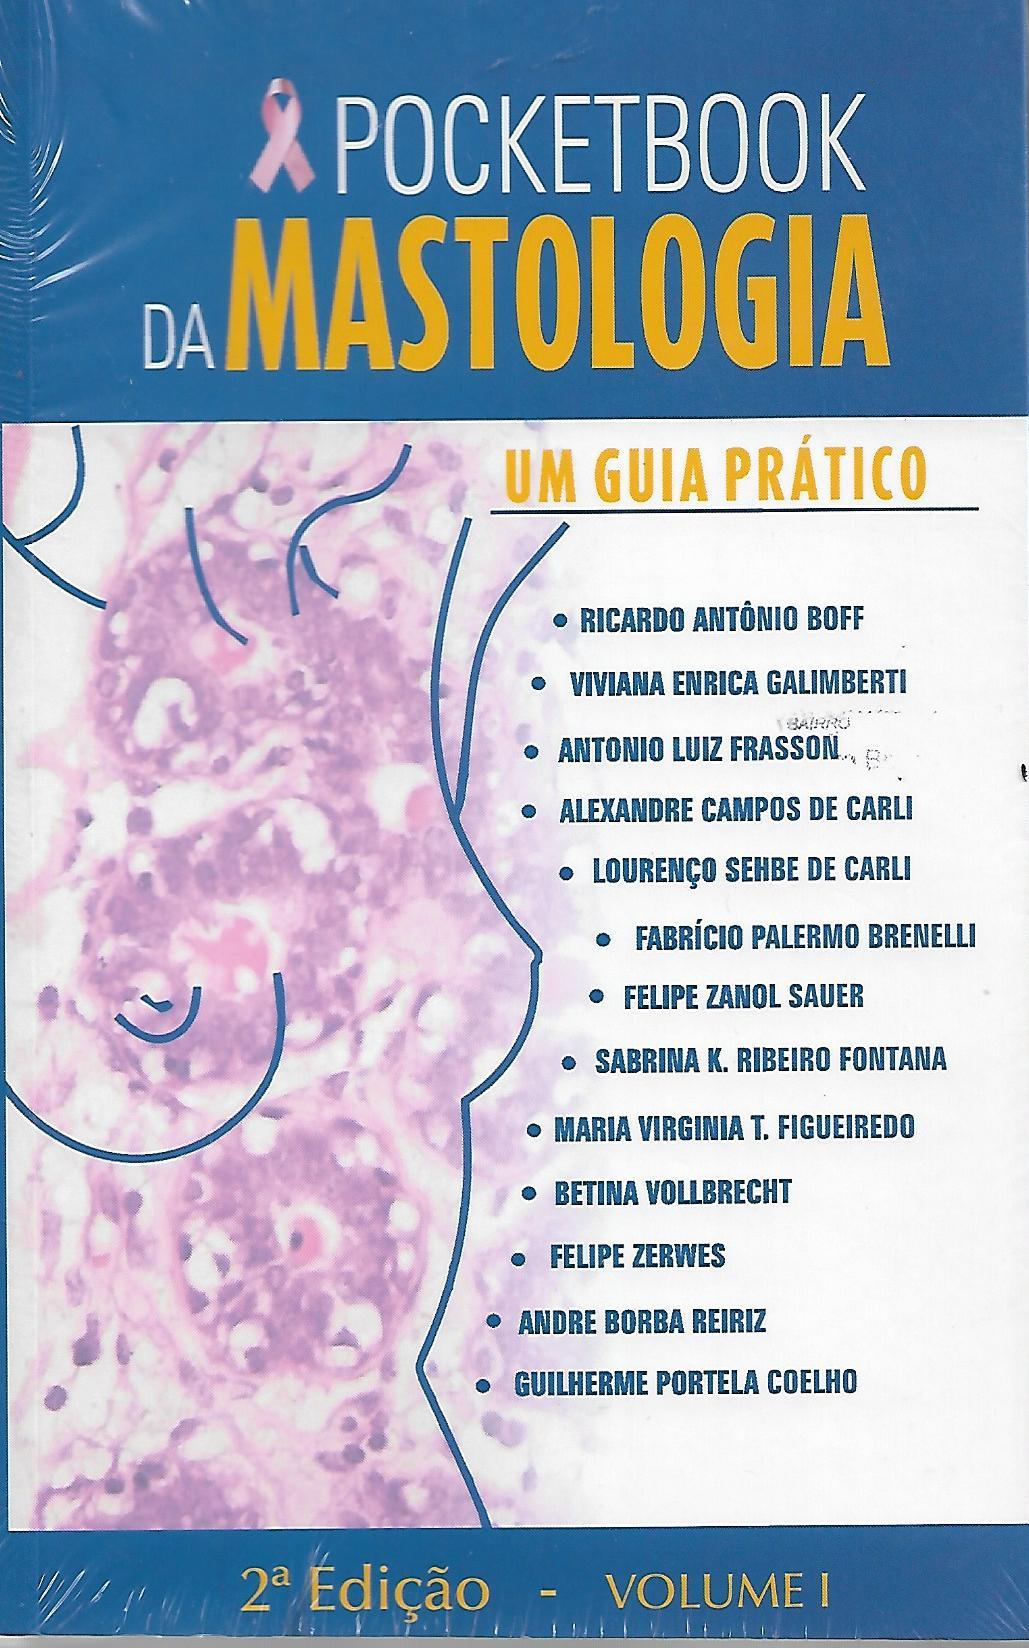 POCKETBOOK DA MASTOLOGIA - VOLUME 1 E 2 - ED. 2019